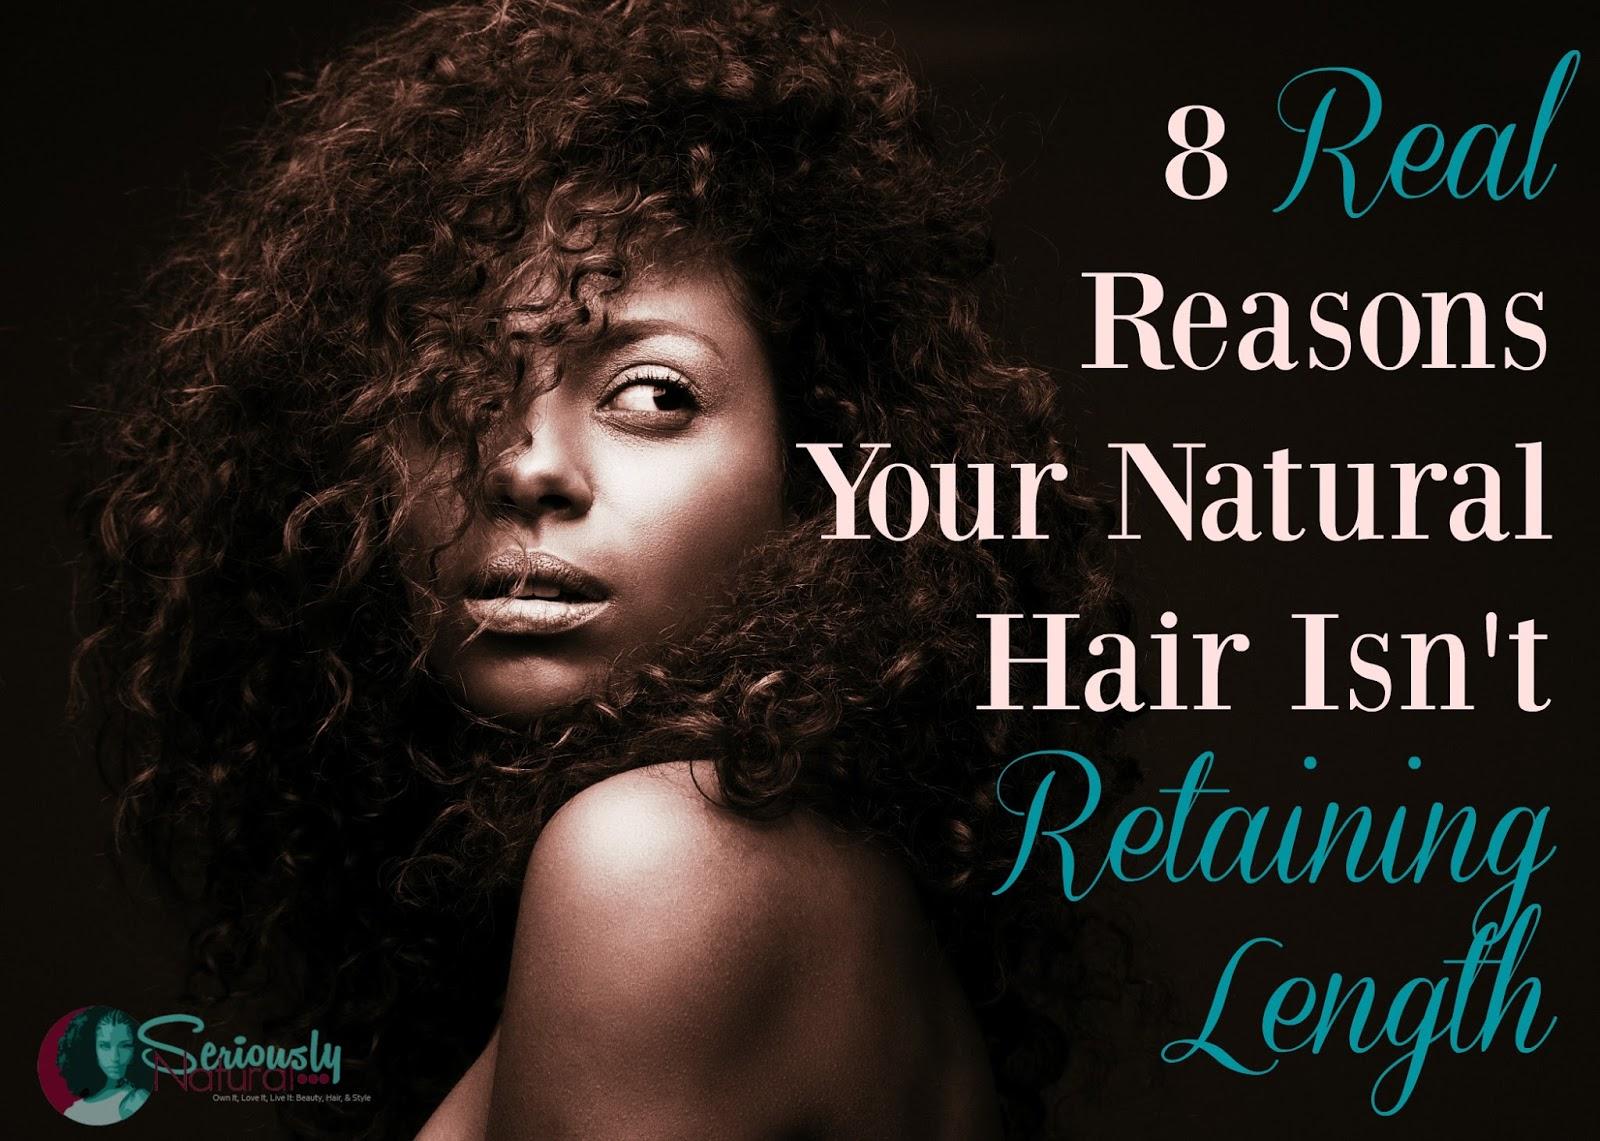 8 Real Reasons Your Natural Hair Isn't Retaining Length